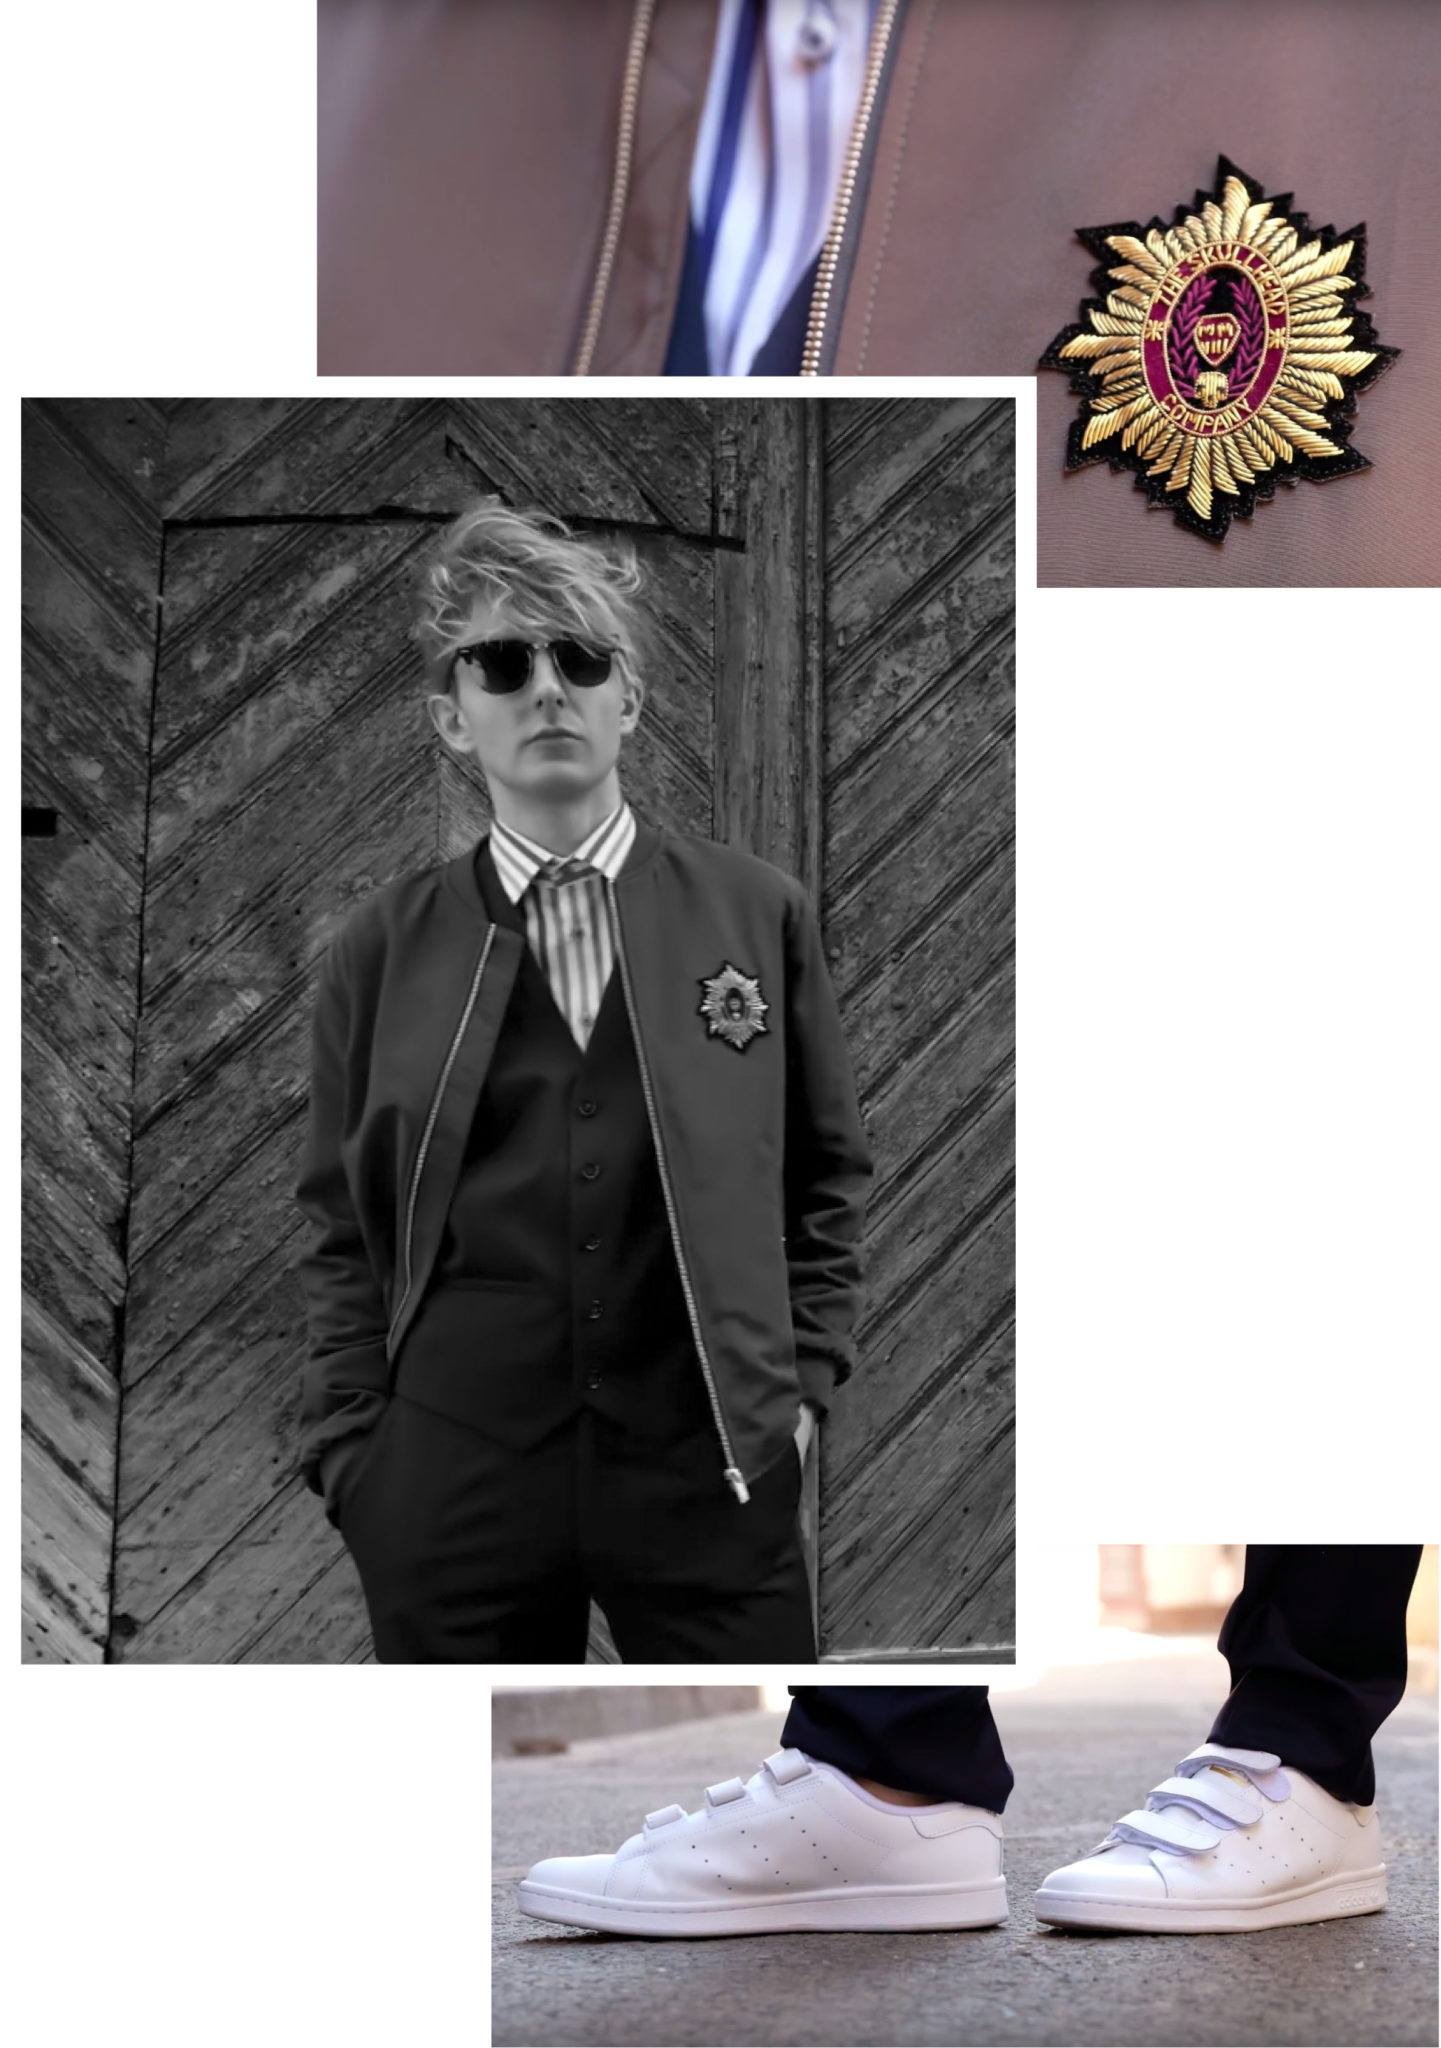 blog-mode-homme-strasbourg-maurice-style-moderniser-costume-galeries-lafayette-nb2